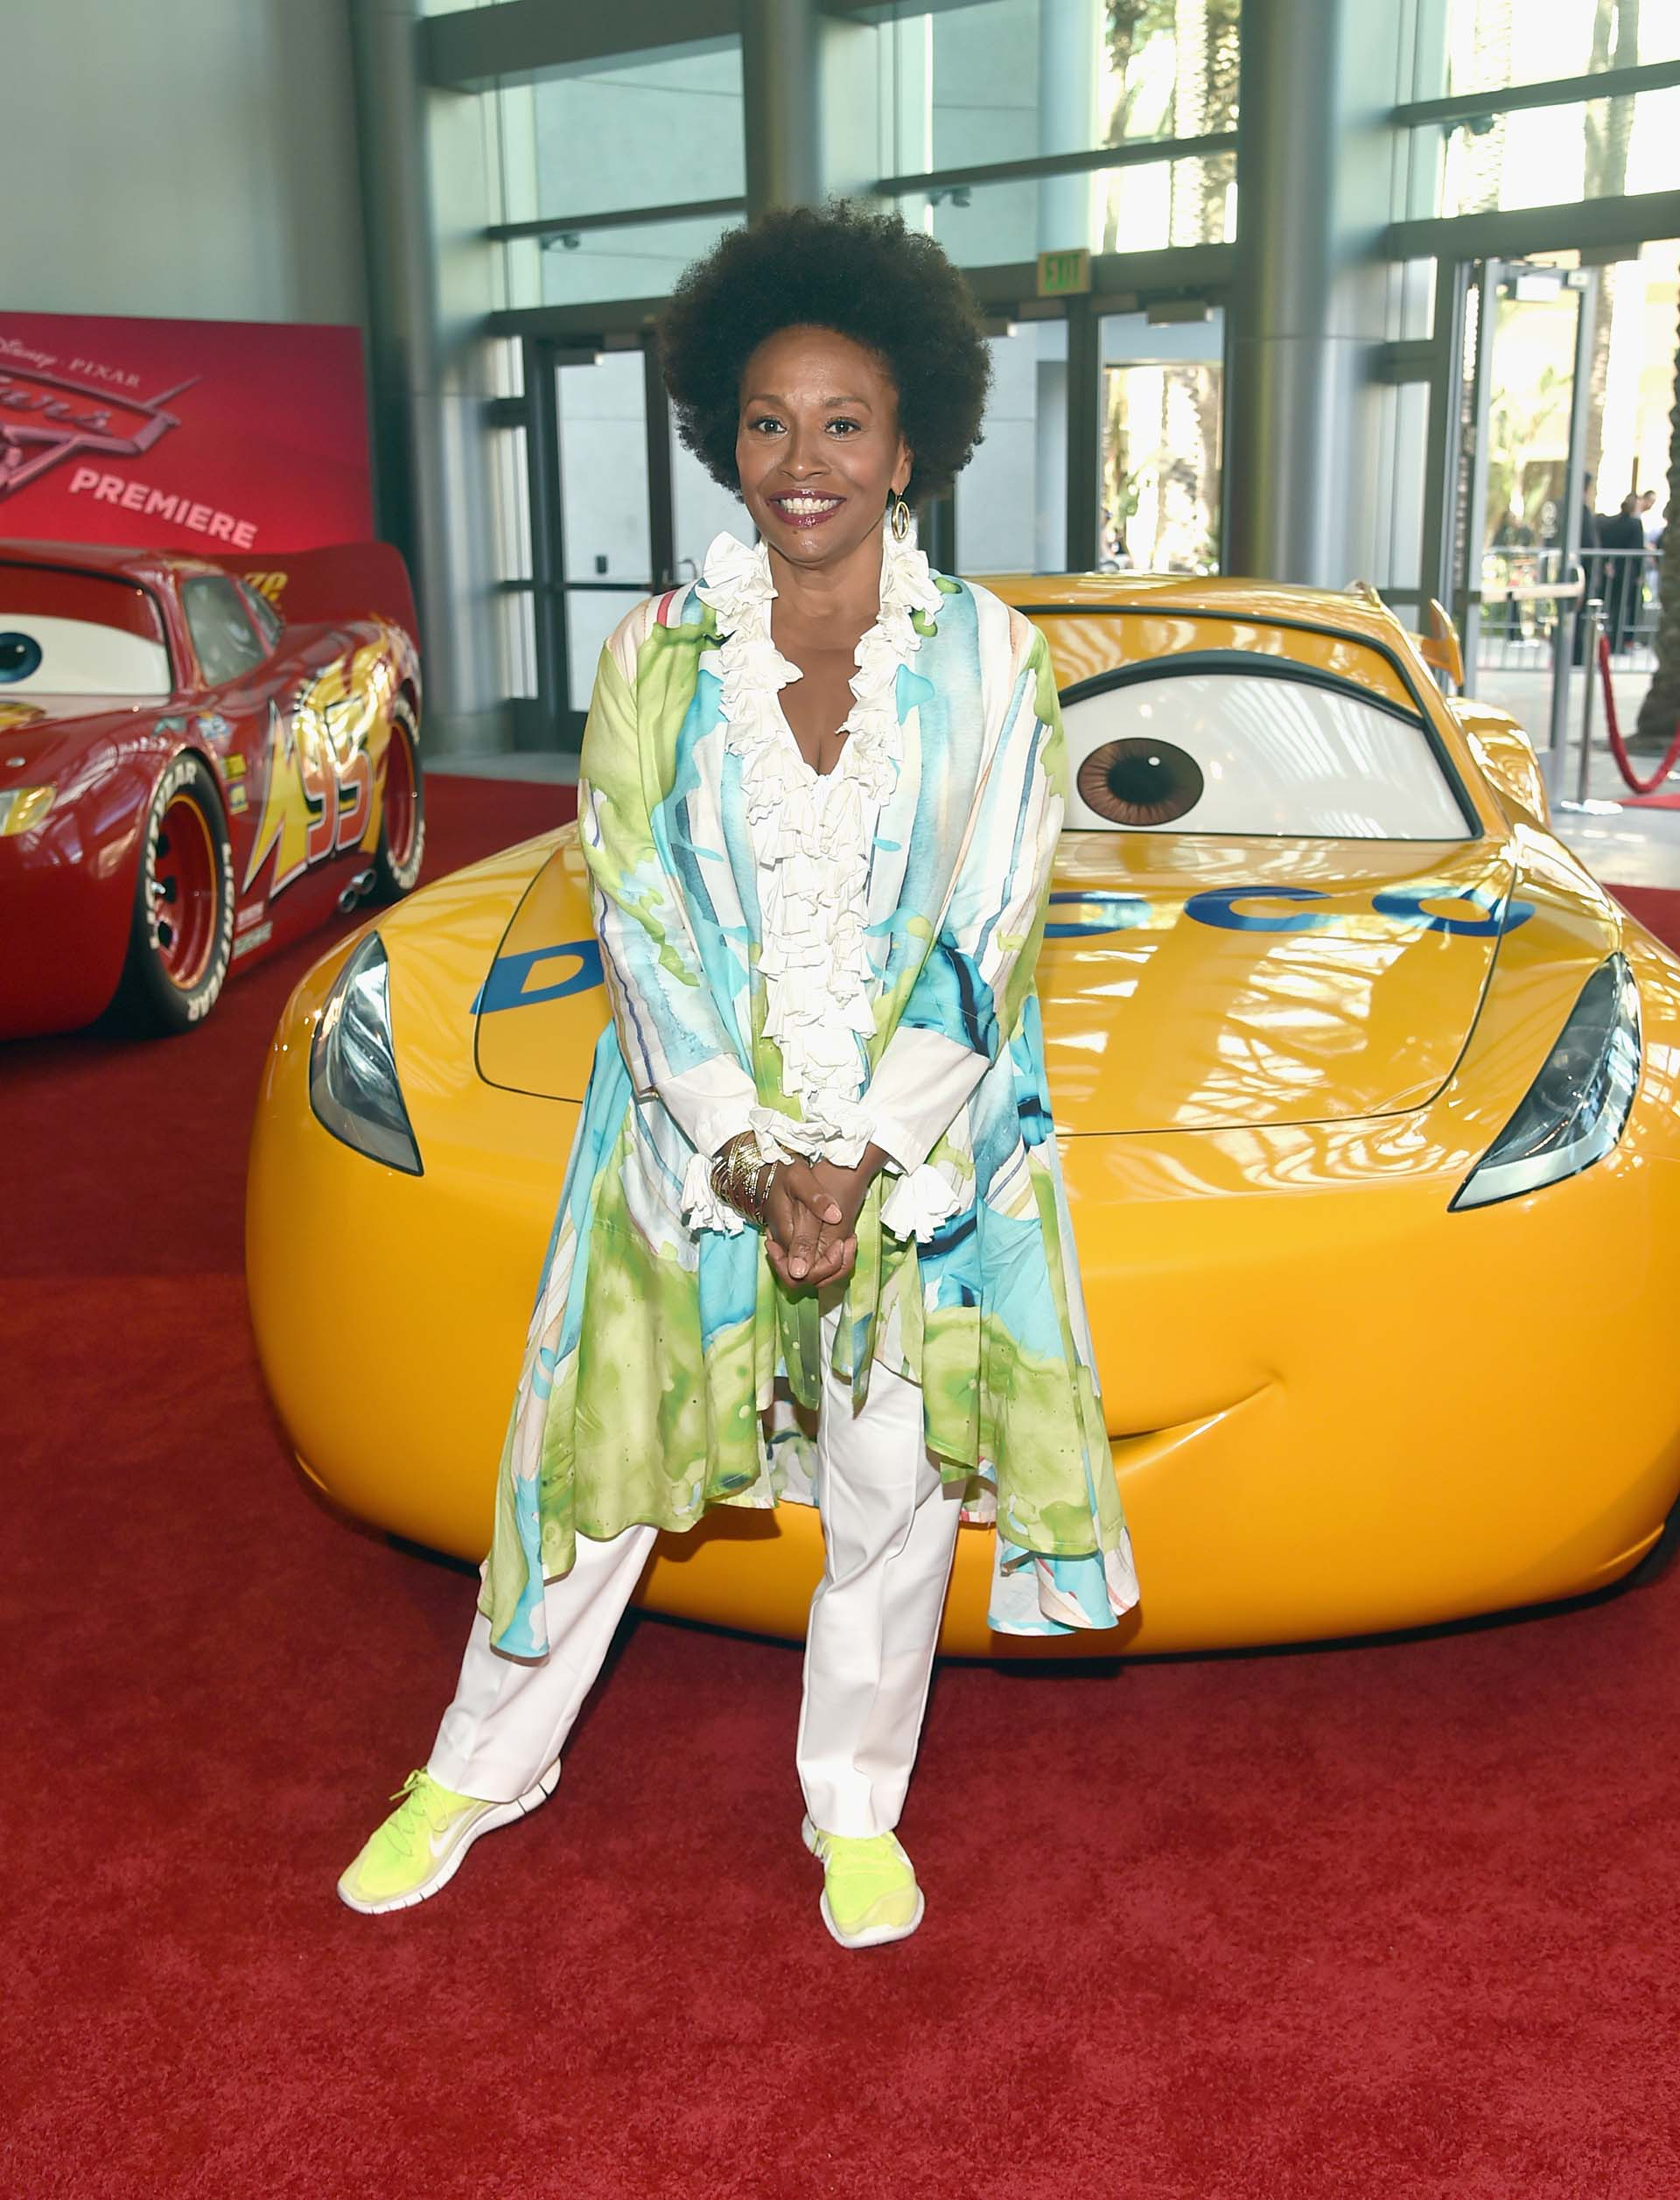 Jennifer Lewis. La esperada película animada continúa el hilo argumental de Cars (2006) y Cars 2 (2011)